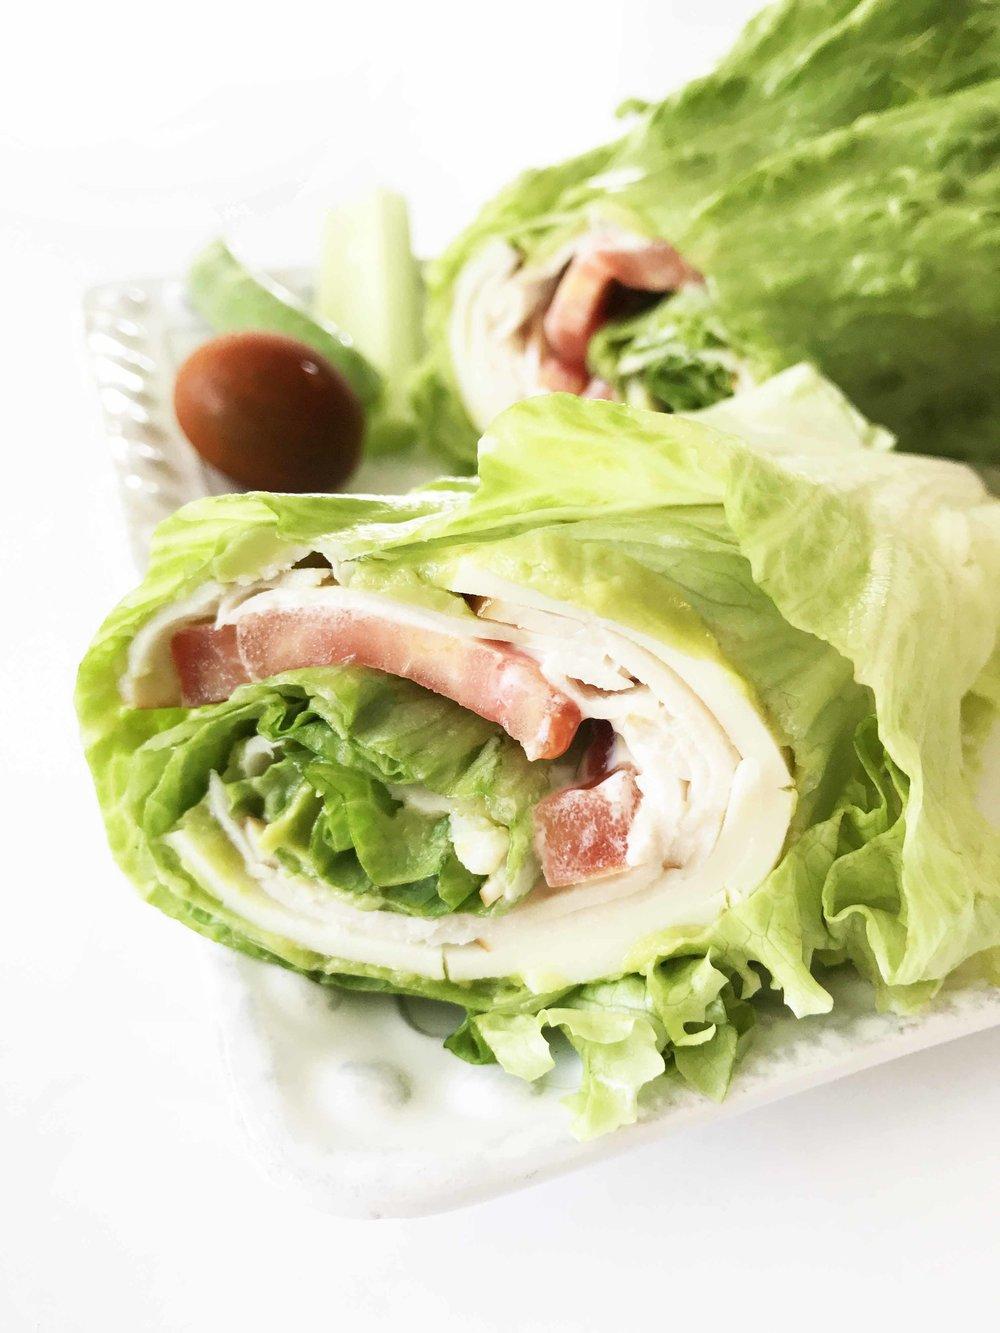 naked-club-sandwich12.jpg